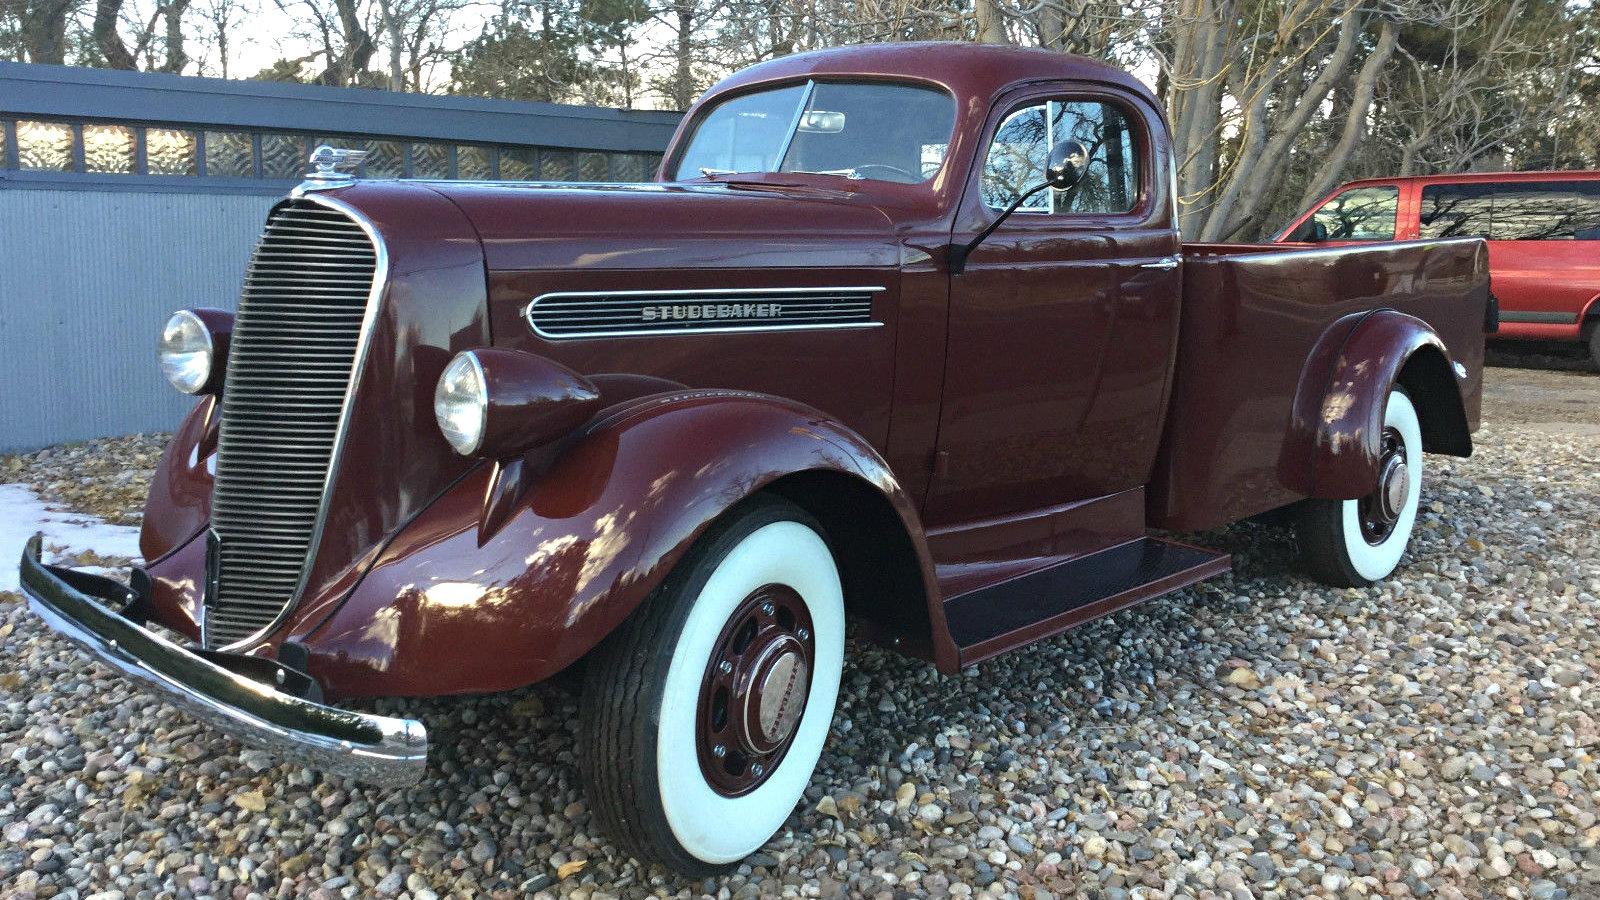 Trucks For Sale In Mn >> Utilitarian Beauty: 1938 Studebaker K10 Fast Express